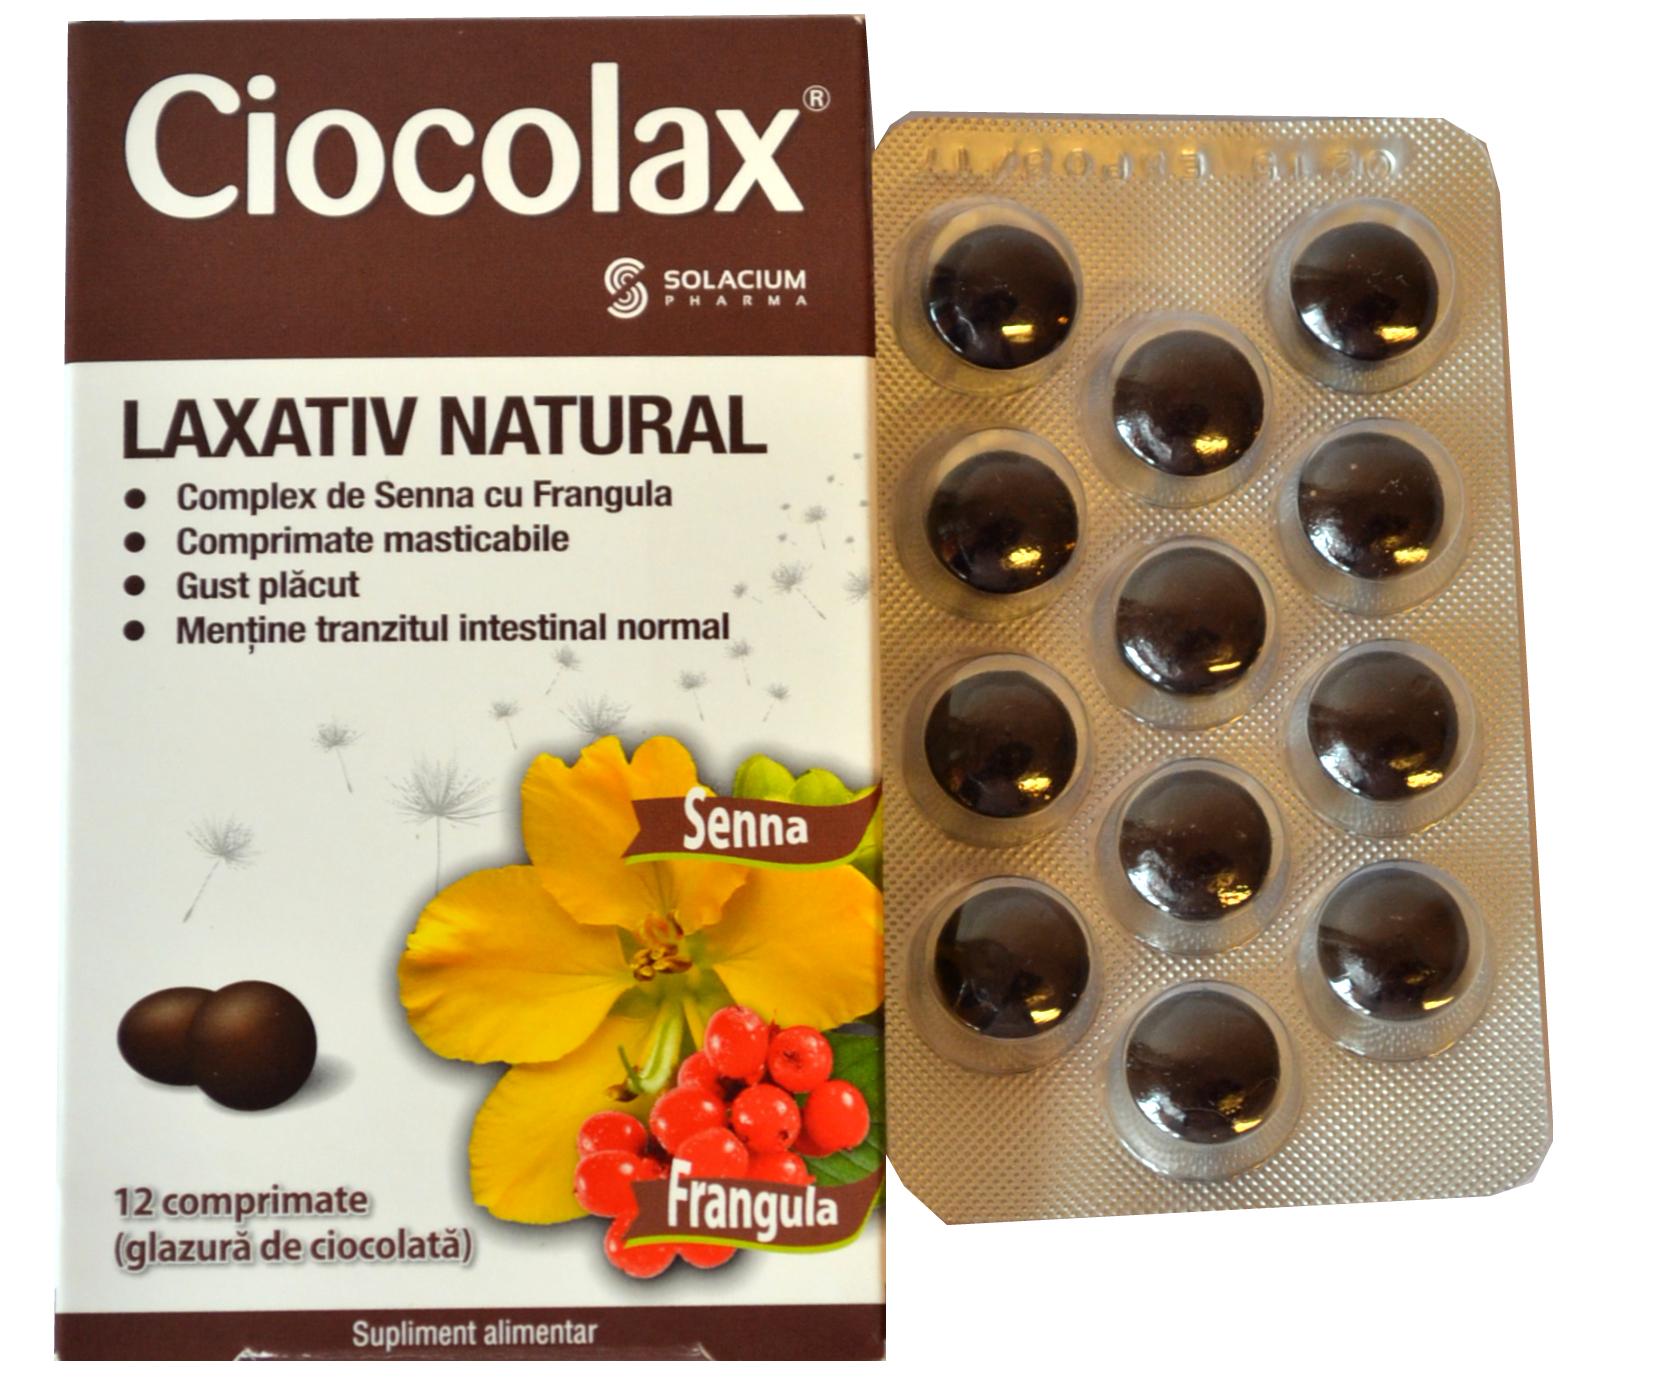 Ciocolax Laxativ Natural 12cpr